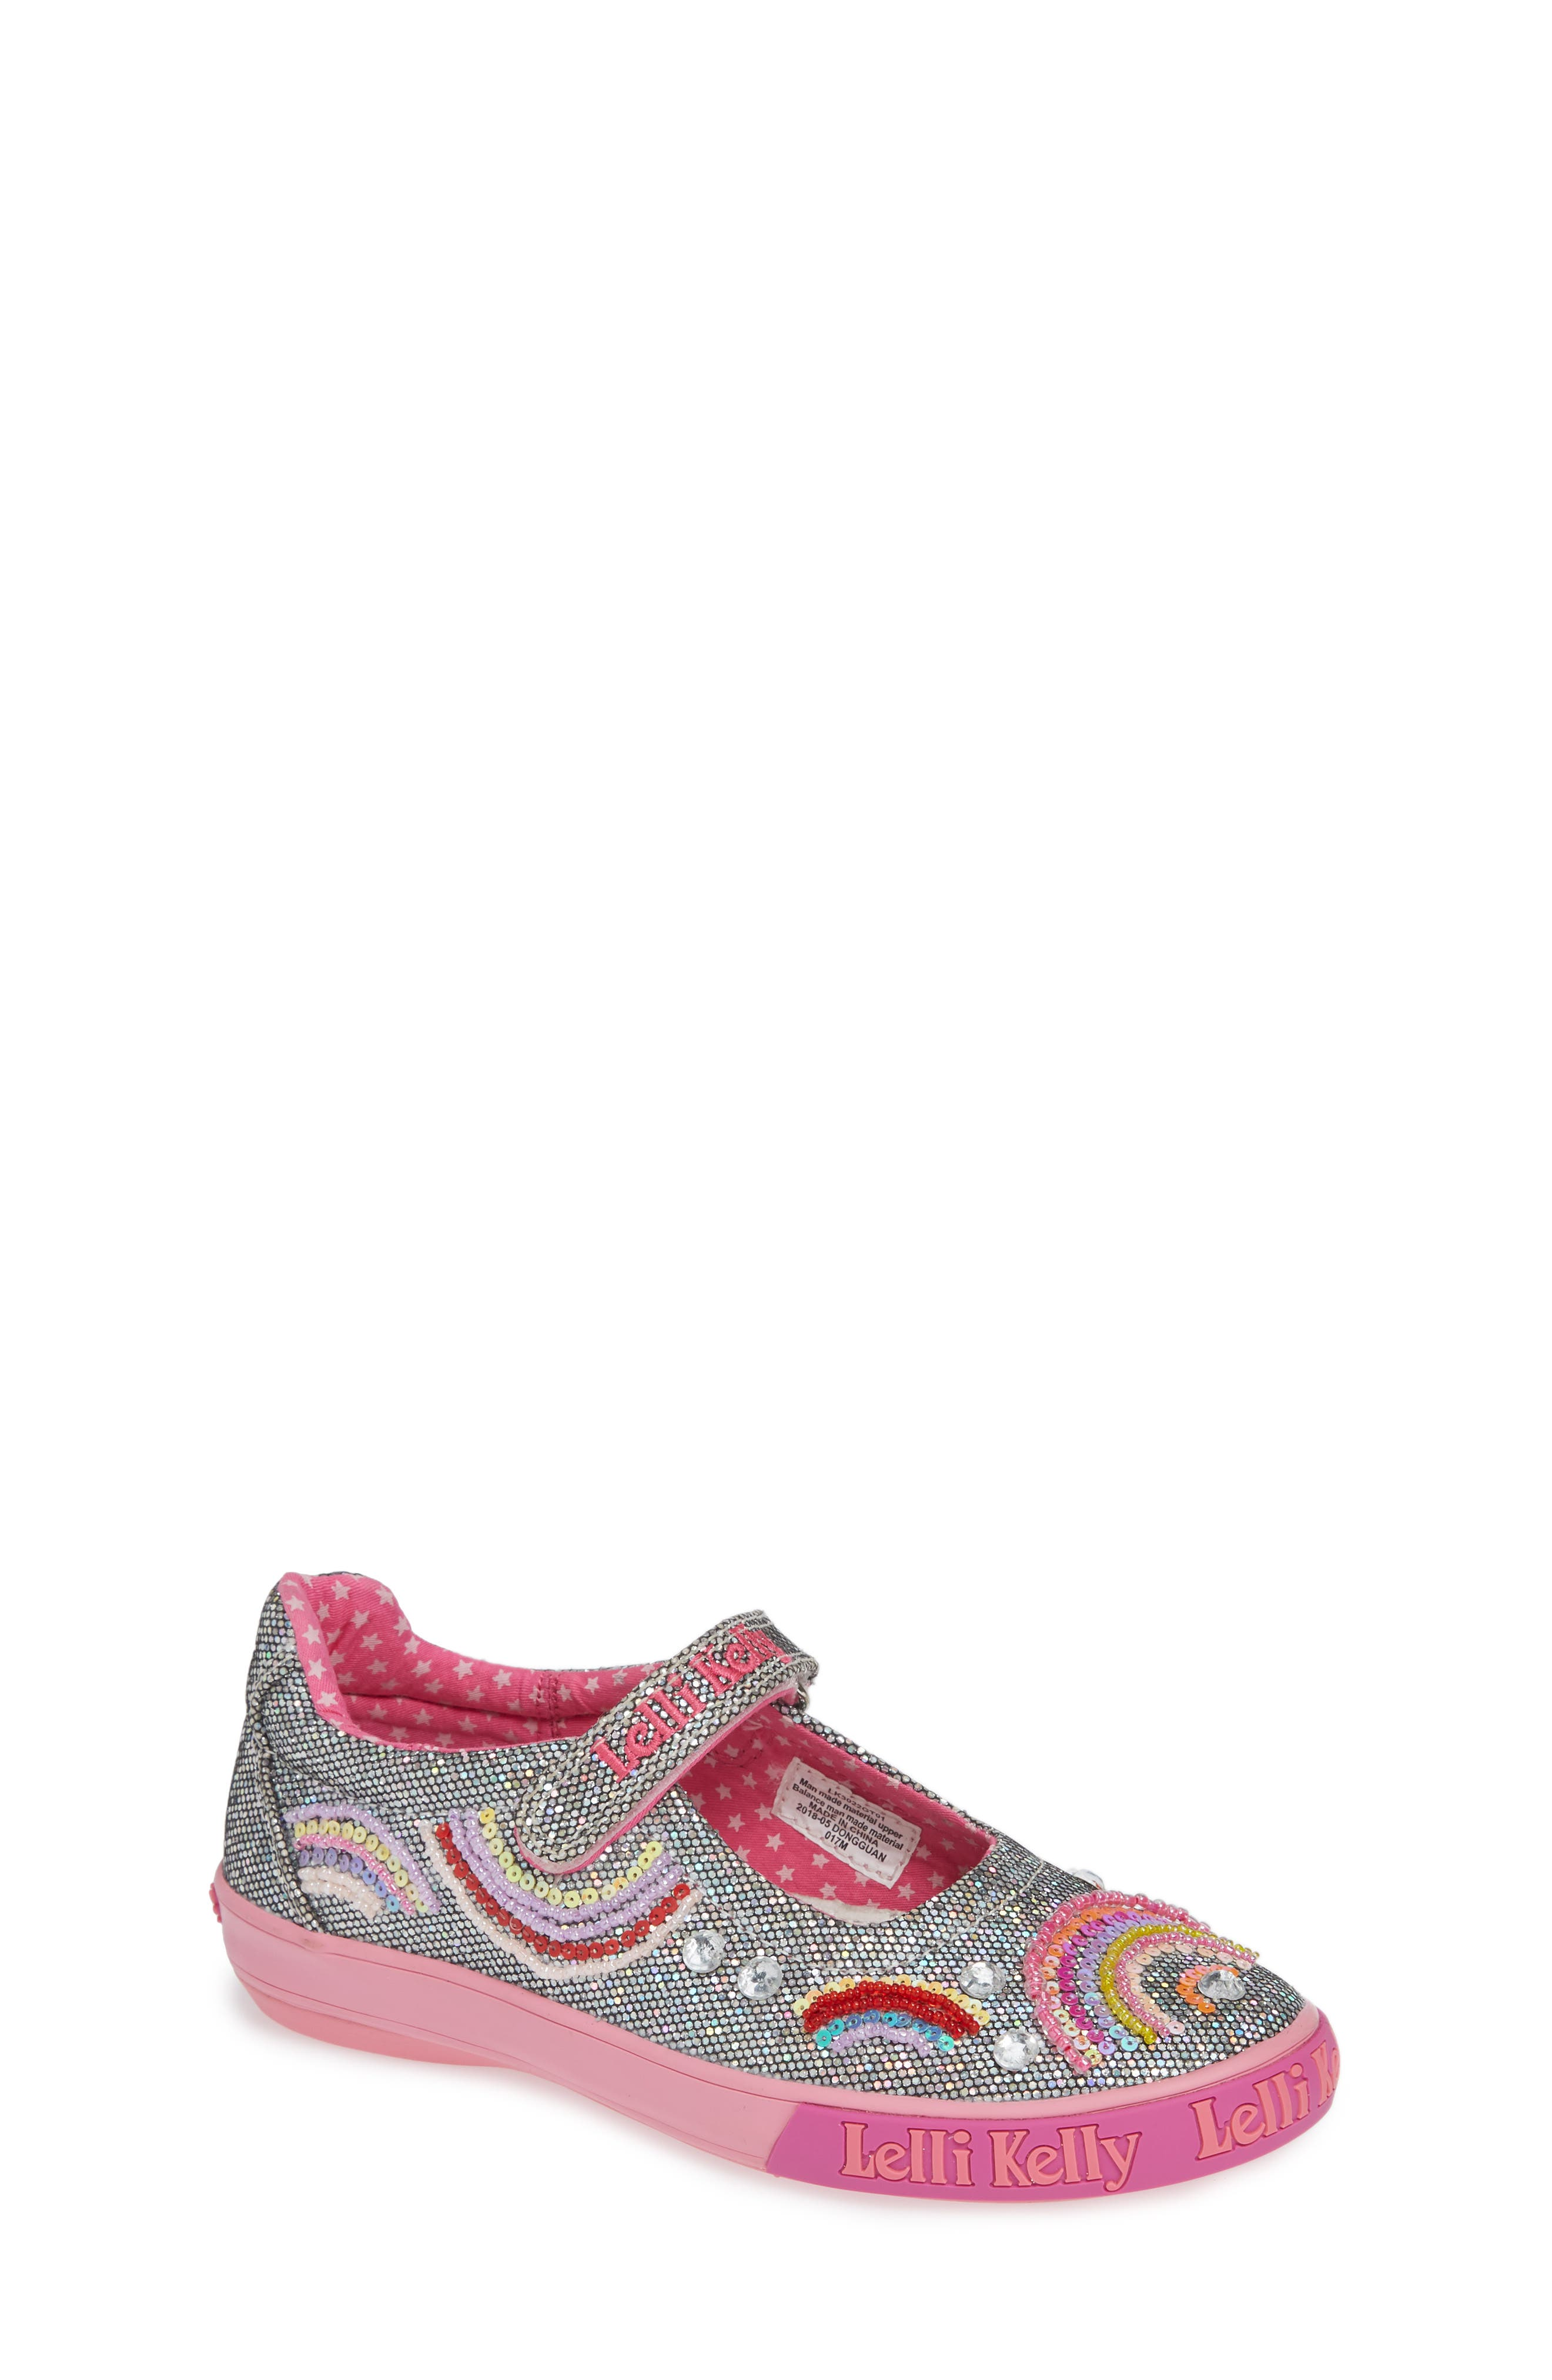 LELLI KELLY, Beaded Rainbow Mary Jane Sneaker, Main thumbnail 1, color, PEWTER